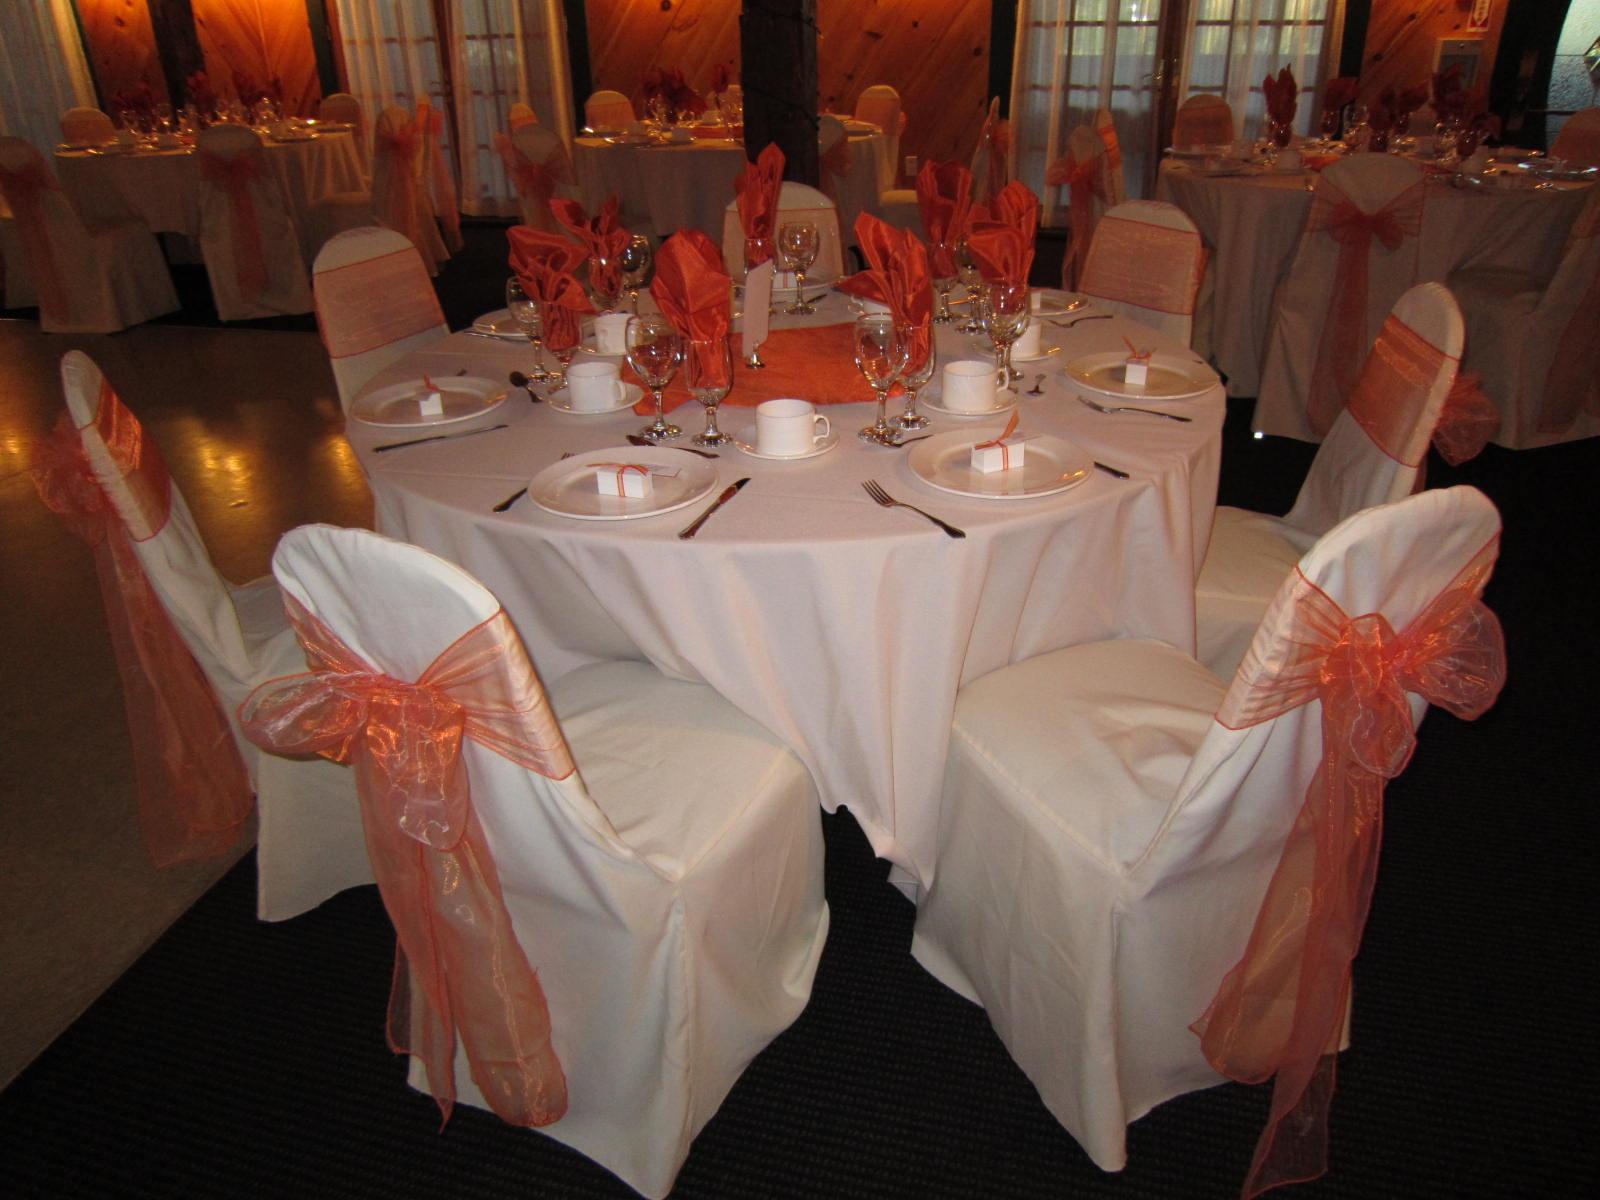 Head Table Draped With Orange Set The Mood Decor